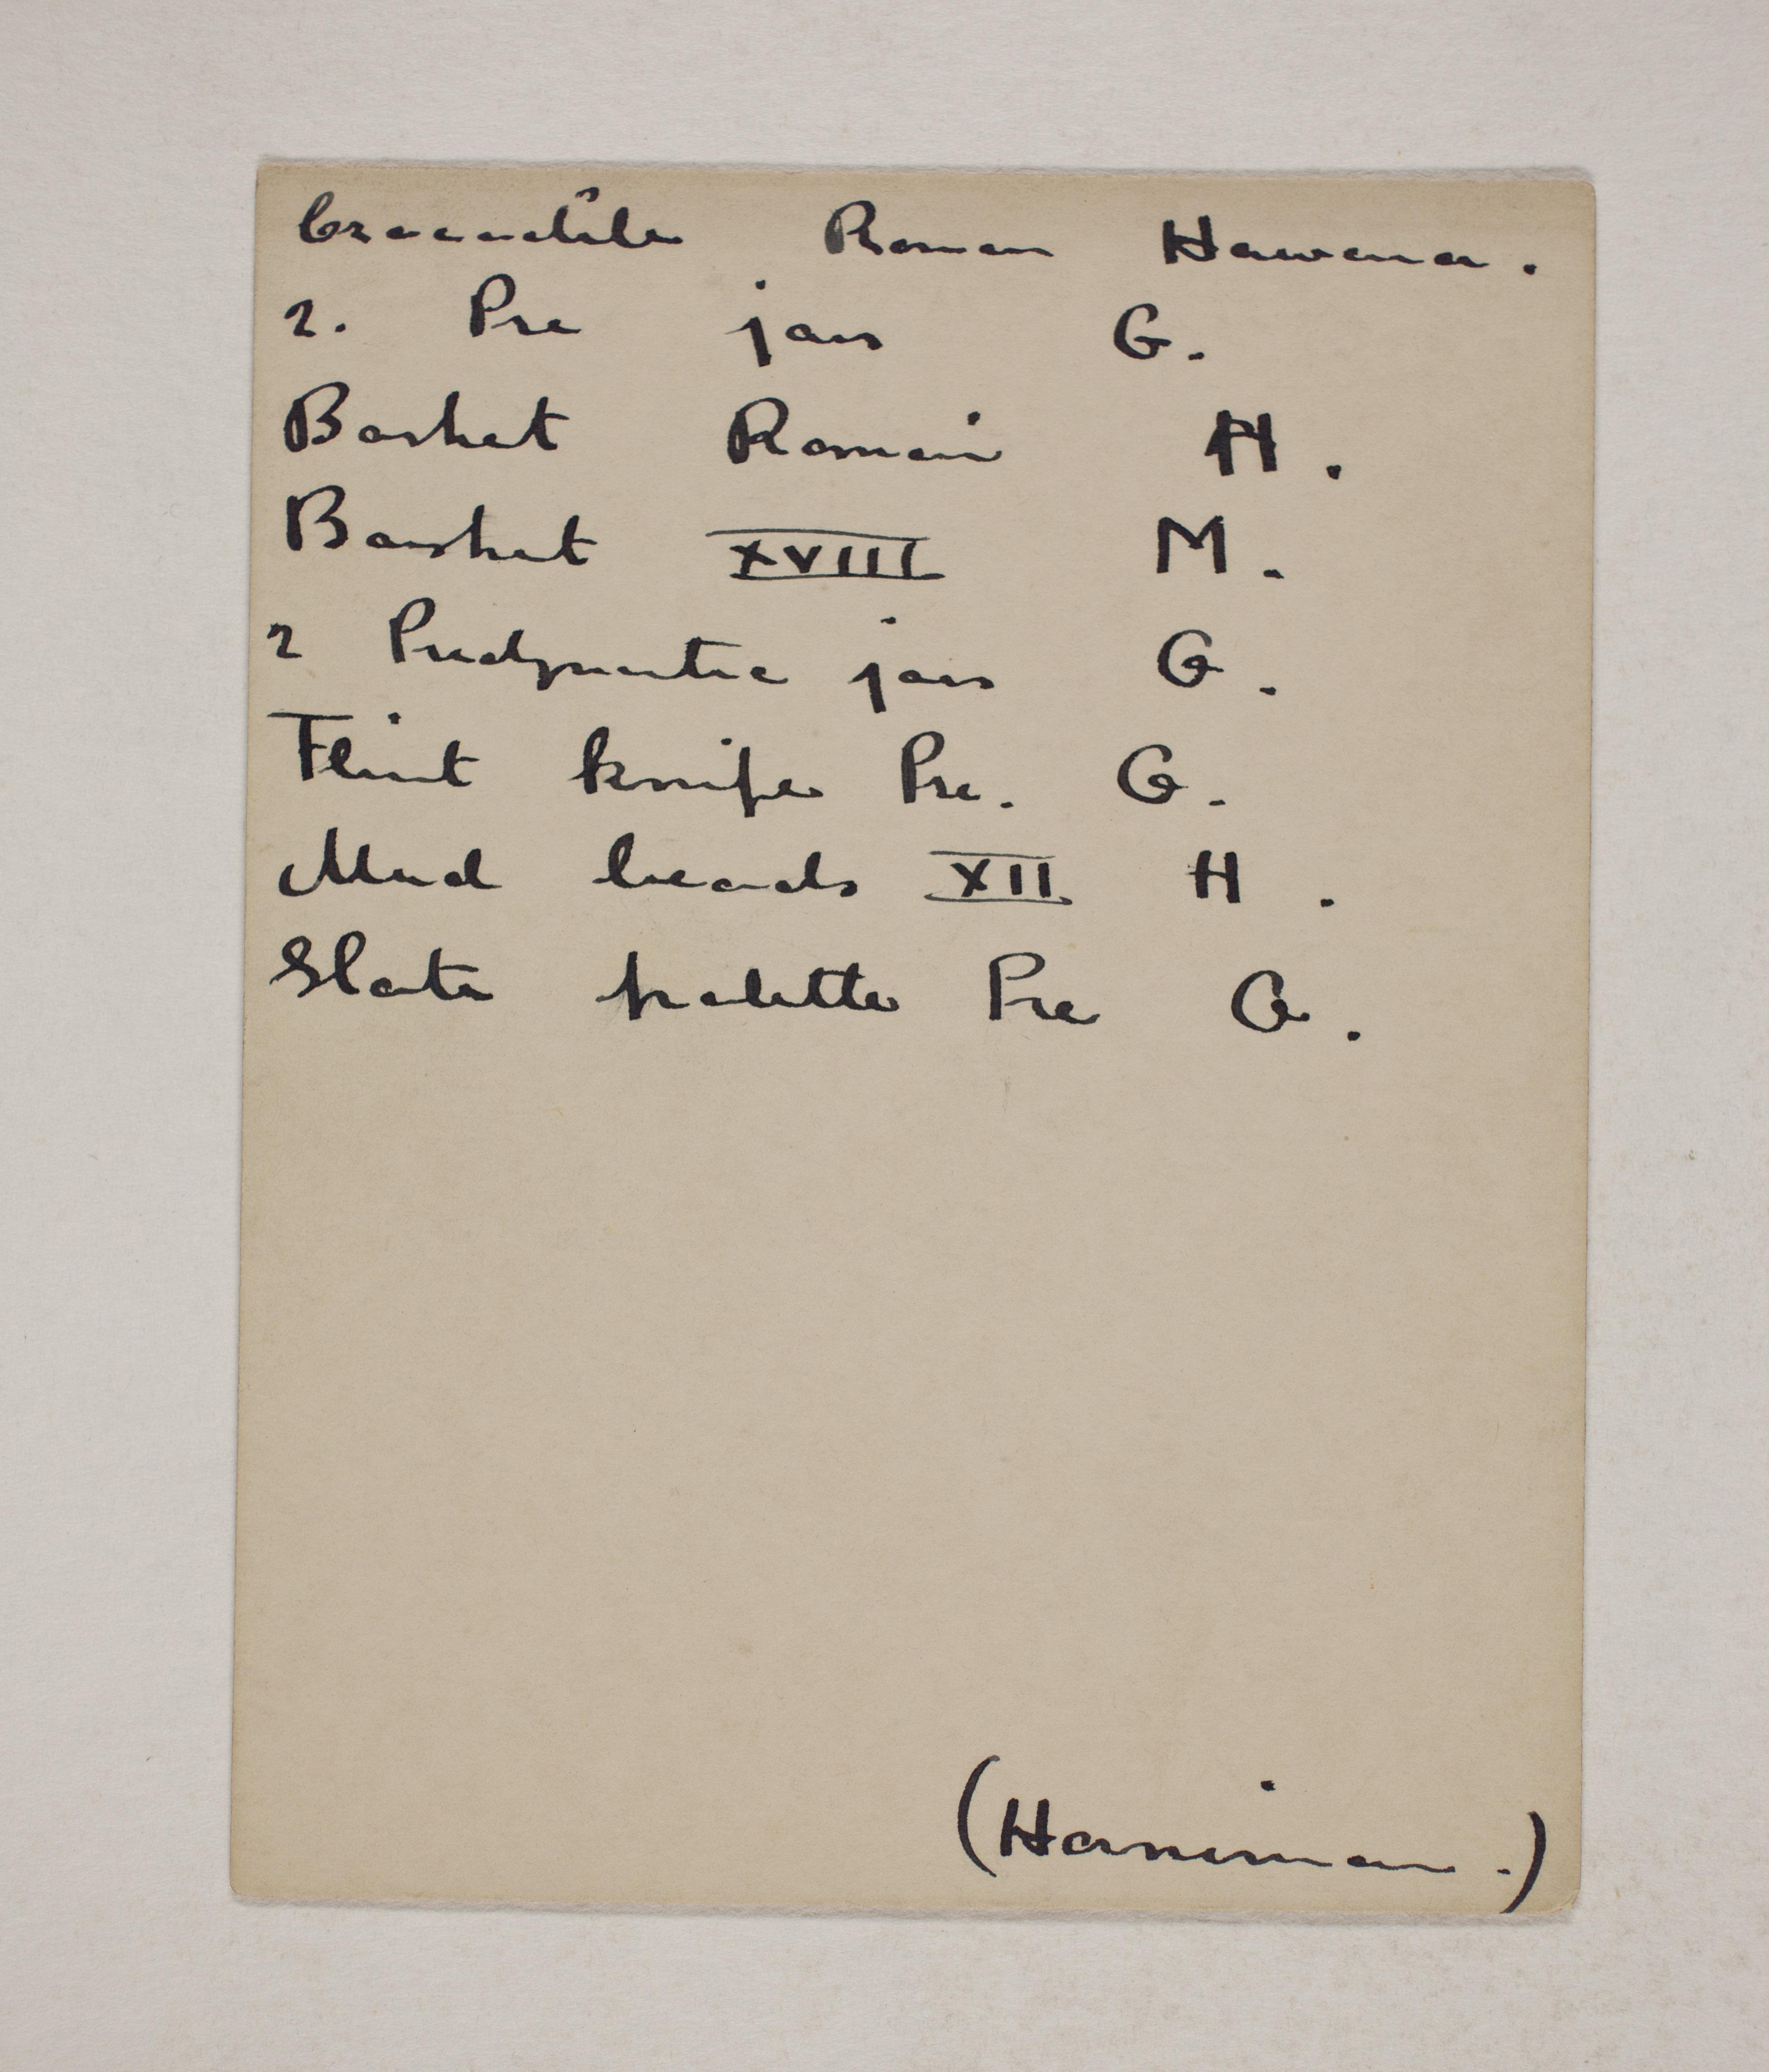 1910-11 Hawara, Gerzeh, Memphis, Mazghuneh Individual institution list  PMA/WFP1/D/19/24